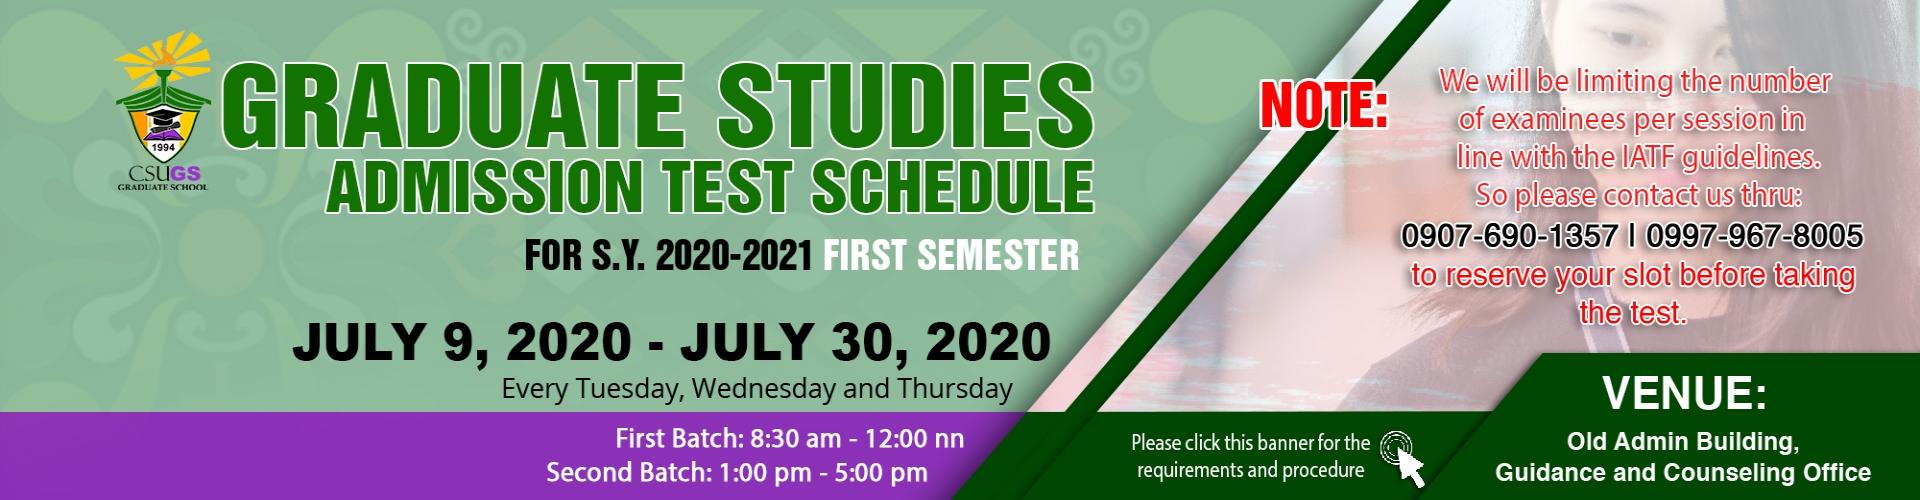 CSU Graduate Studies Admission Test Schedule S.Y 2020-2021